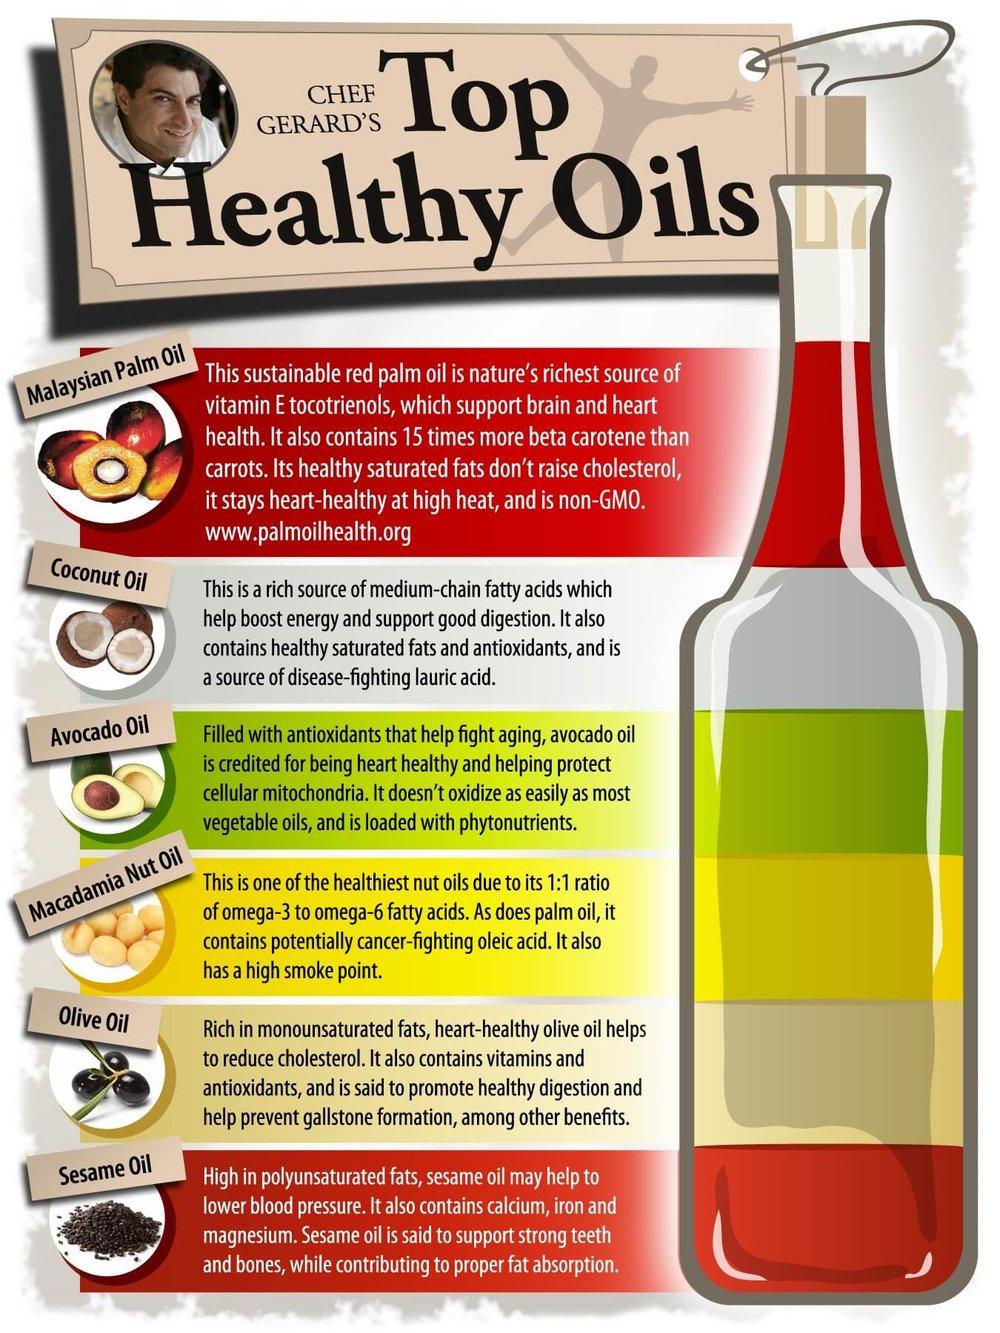 Chef_s Top Healthy Oils.jpg